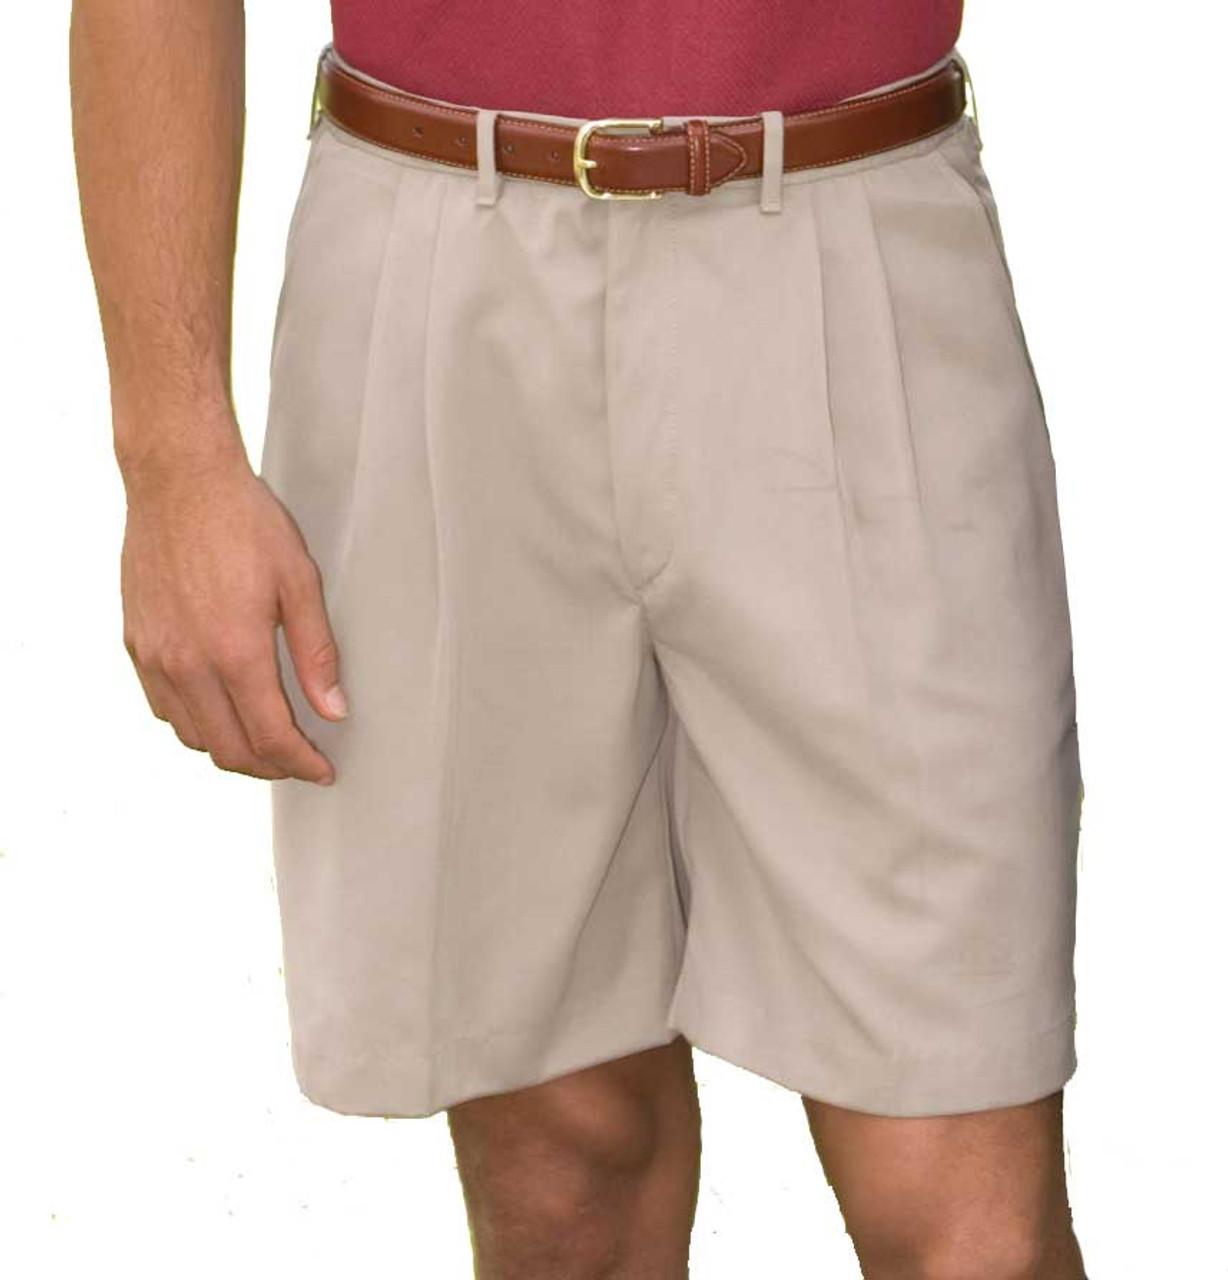 Microfiber Uniform Shorts